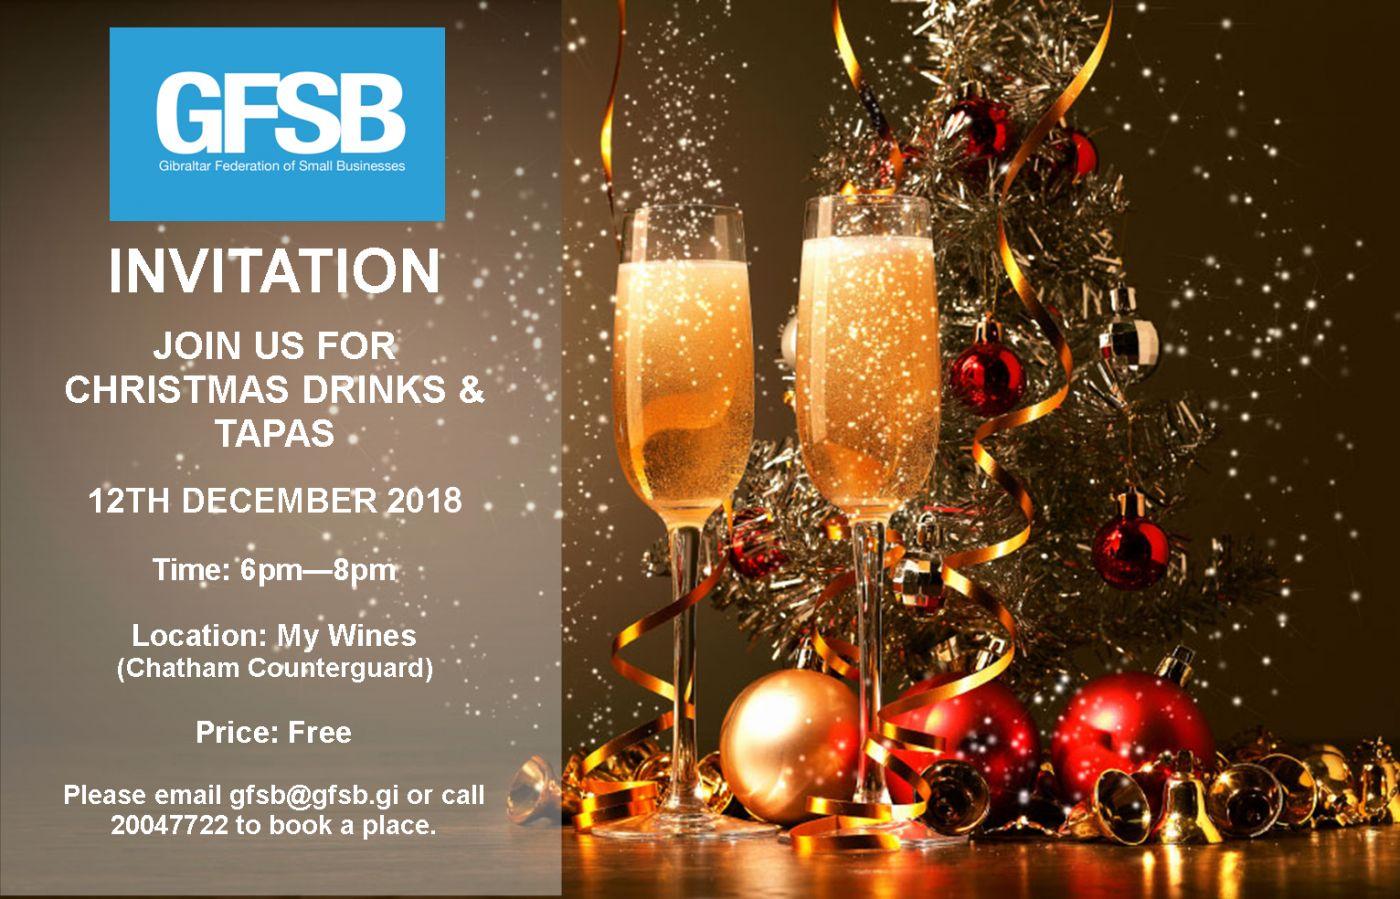 Members Christmas Drinks Tapas Gibraltar Federation Of